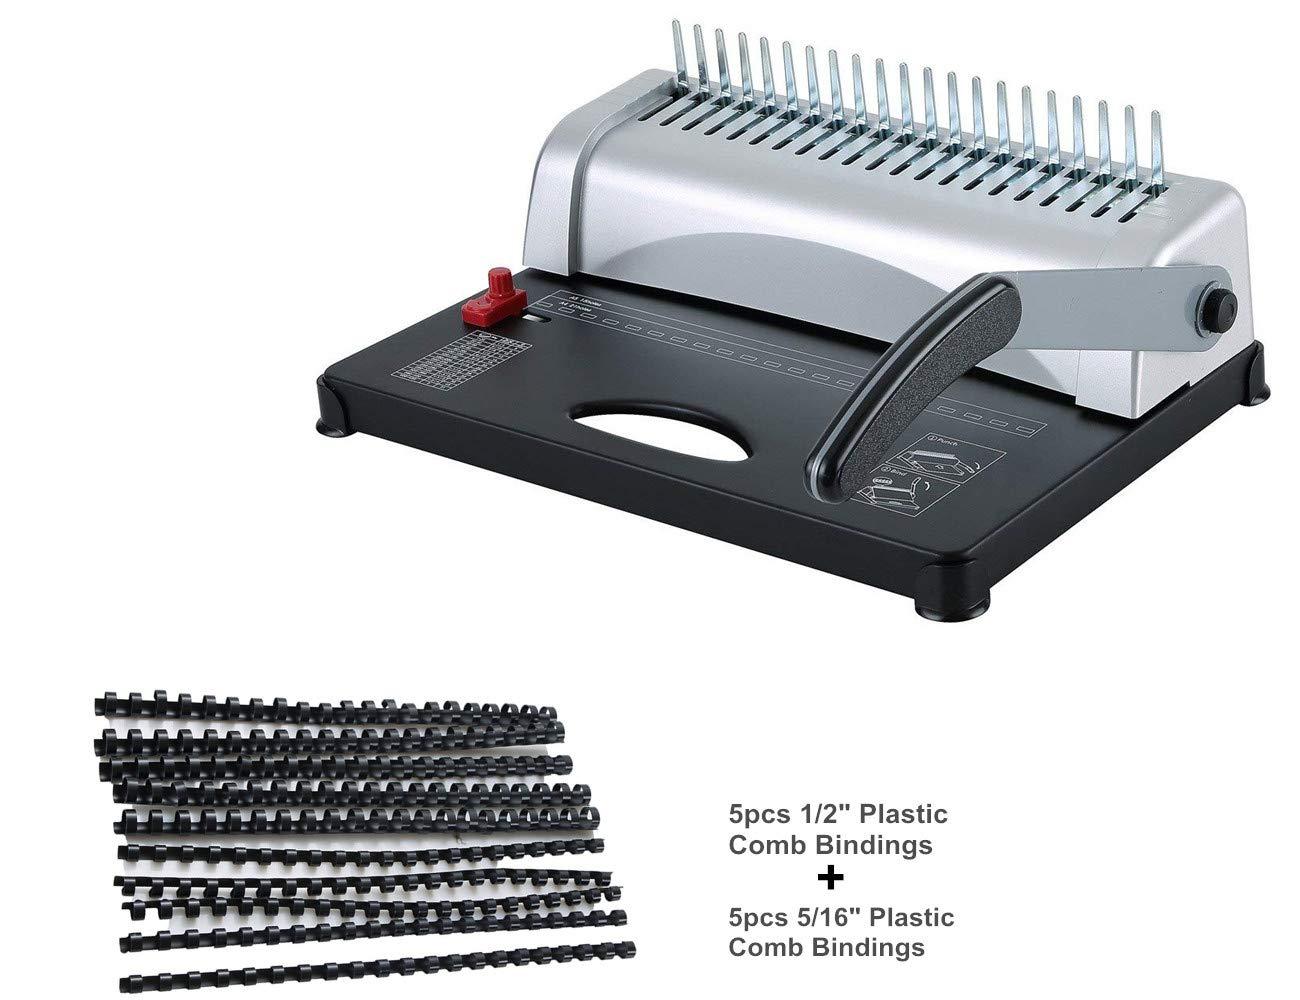 FLK Tech Binding Machine with Starter Combs Set - 21 Hole / 450 Sheets Paper Punch Binder